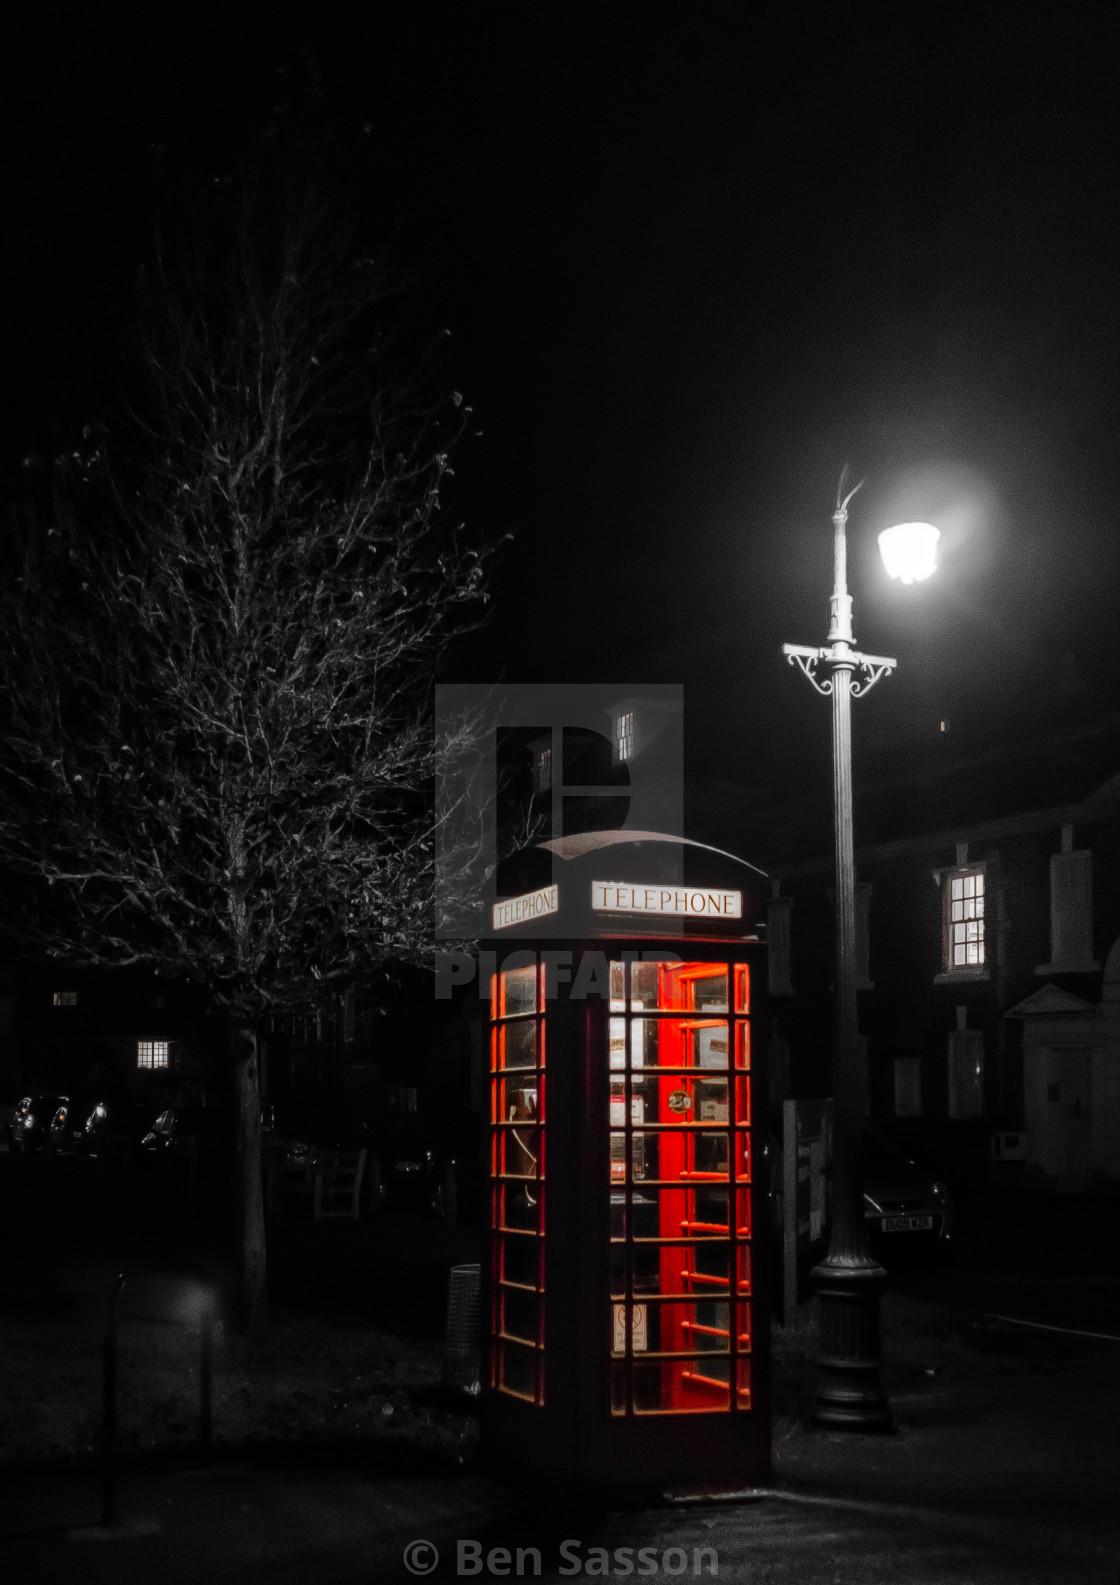 """Telephone box at night, UK"" stock image"